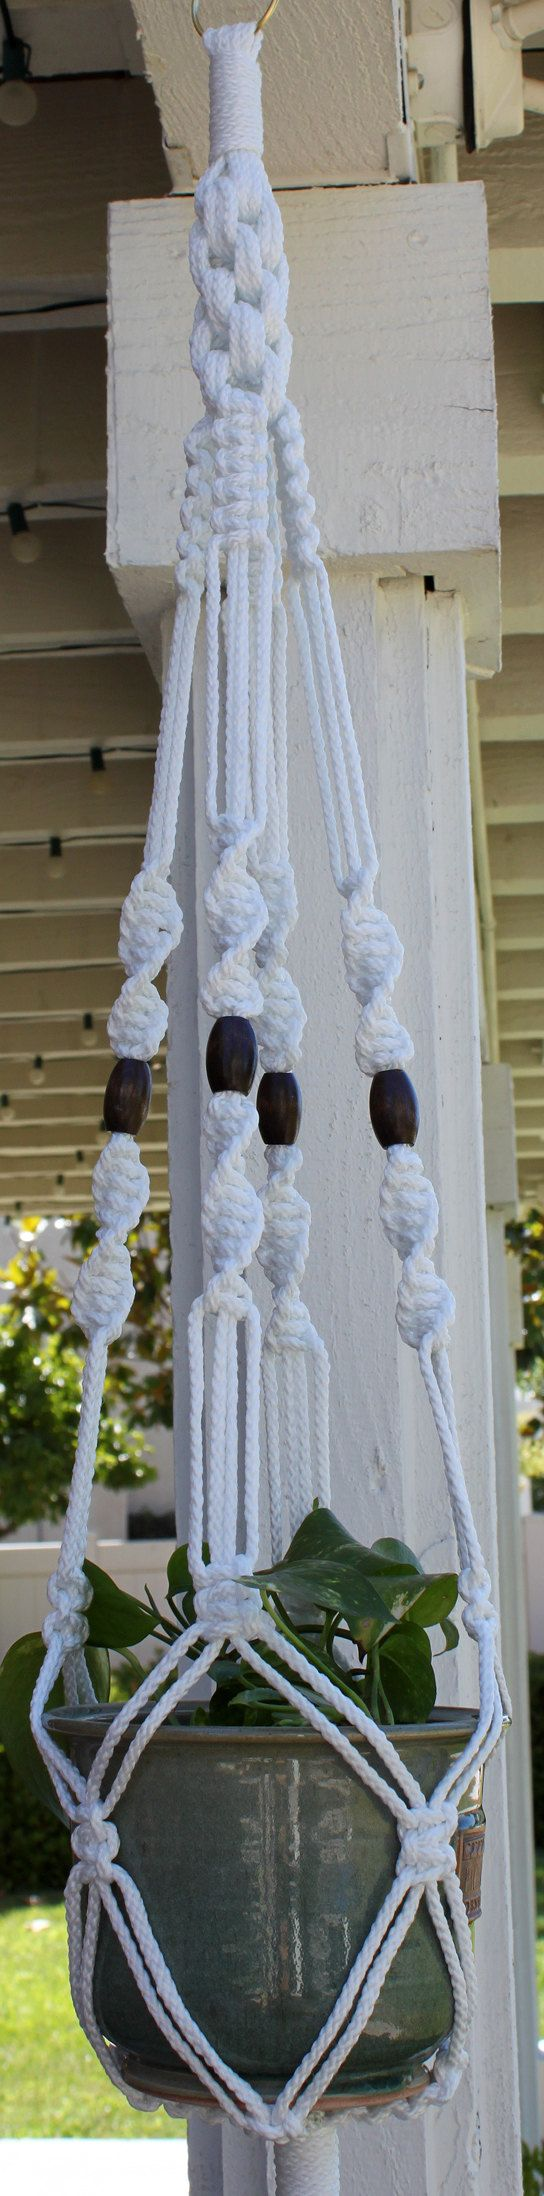 Macrame Plant Hanger Holder - CROWNE ROYALE - 6mm Braided Poly Cord - White #macrame #plant hanger gerat inspiration for my shop MacrameLoveJewelry.etsy.com